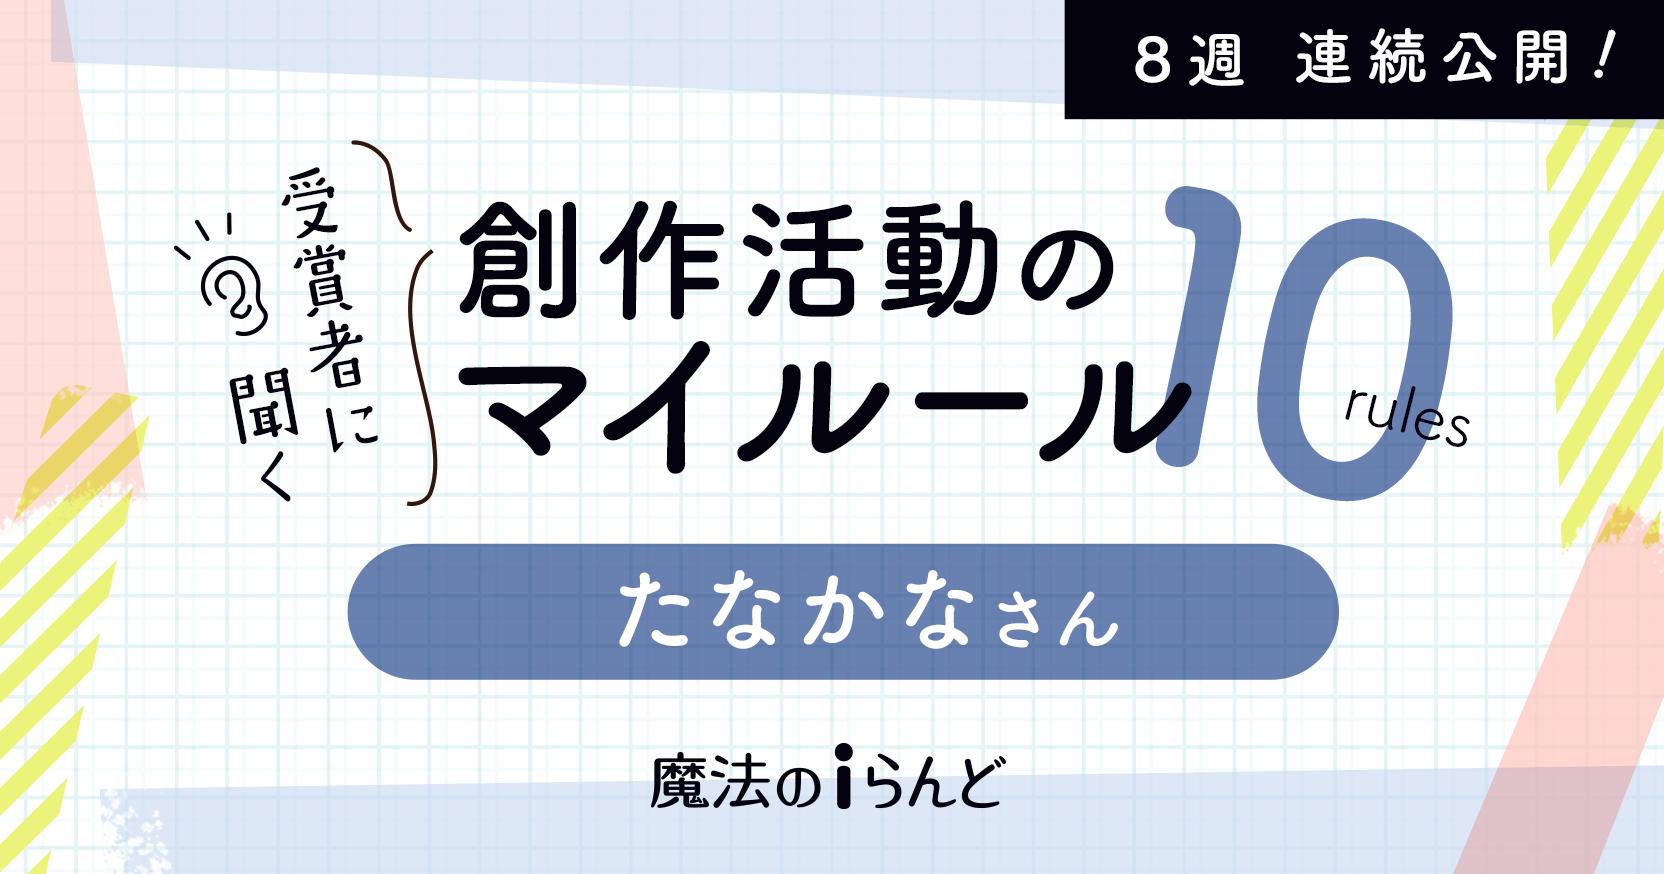 https://storage.googleapis.com/blog-info/entry/2021/08/02-myrule-tanakana_ogp.png